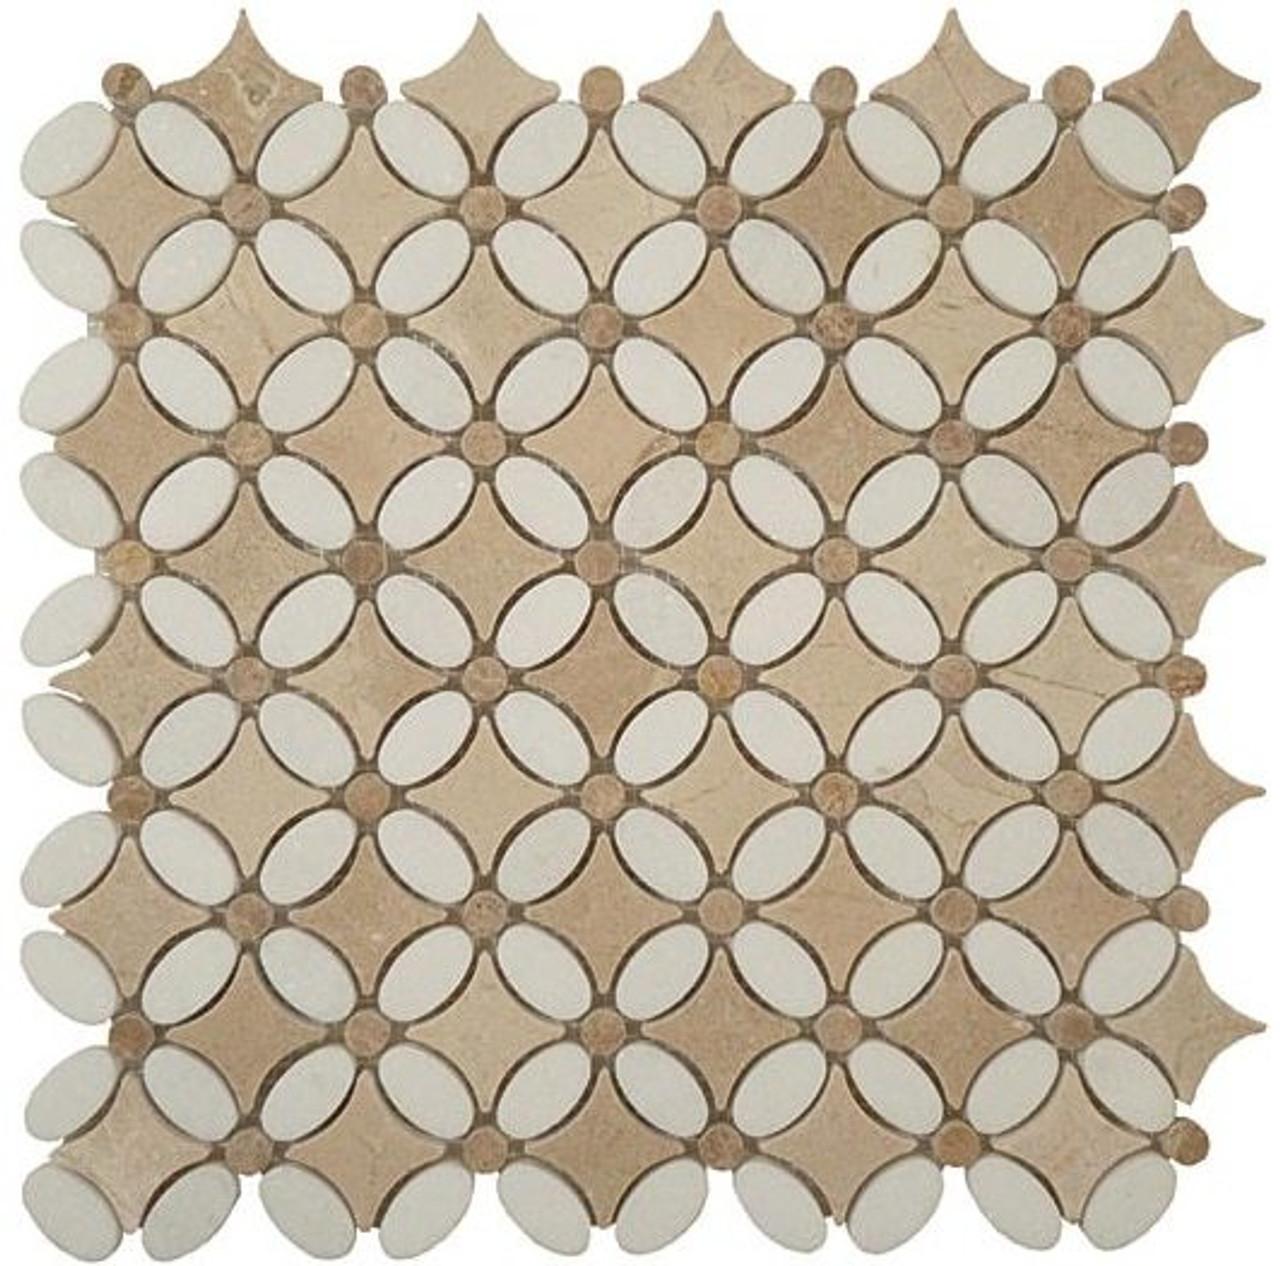 Bella Glass Tiles Flower Series FS-73 marble mosaic tile